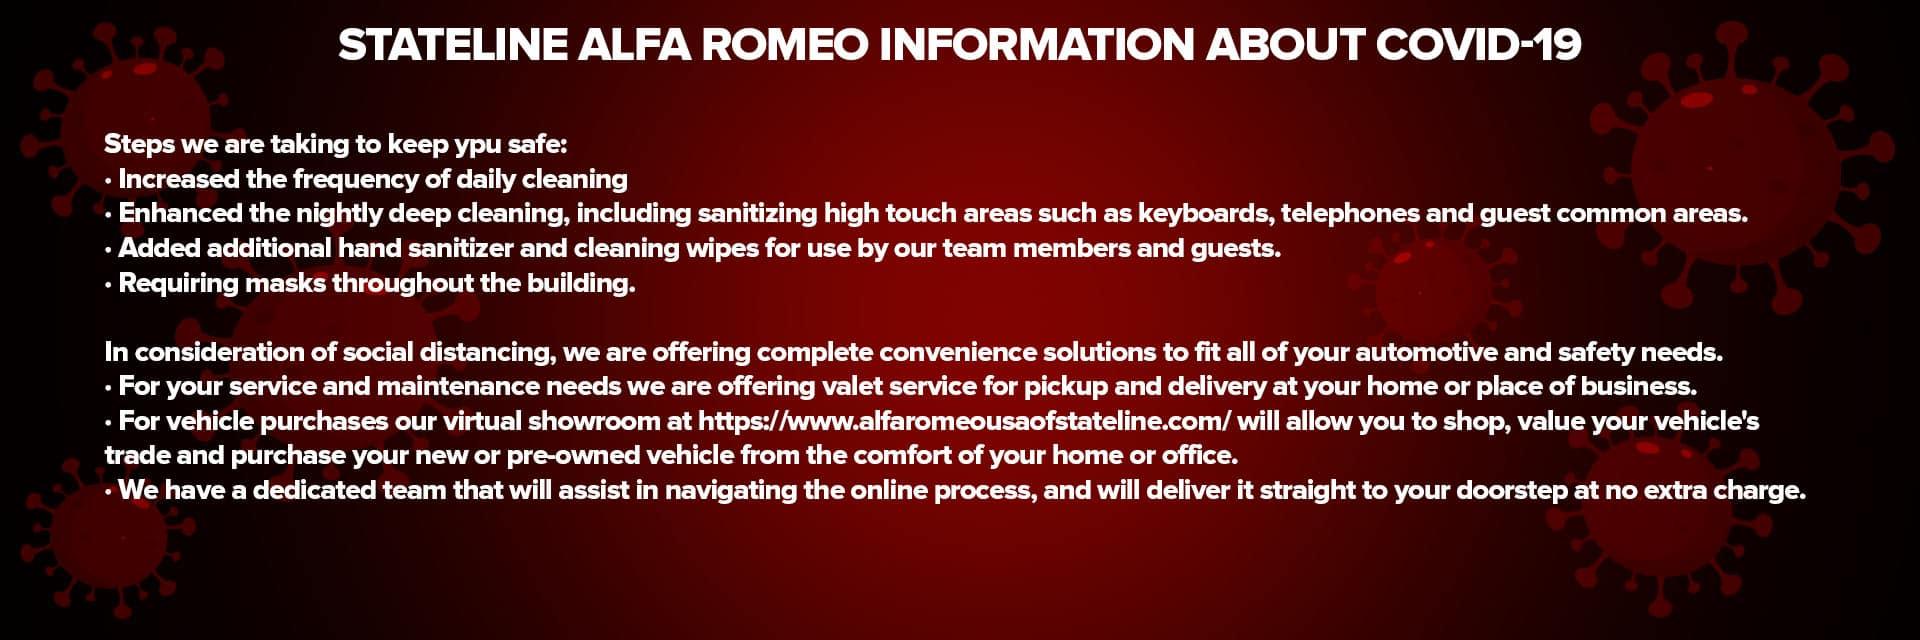 Covid Info Sliders-Stateline Alfa Romeo